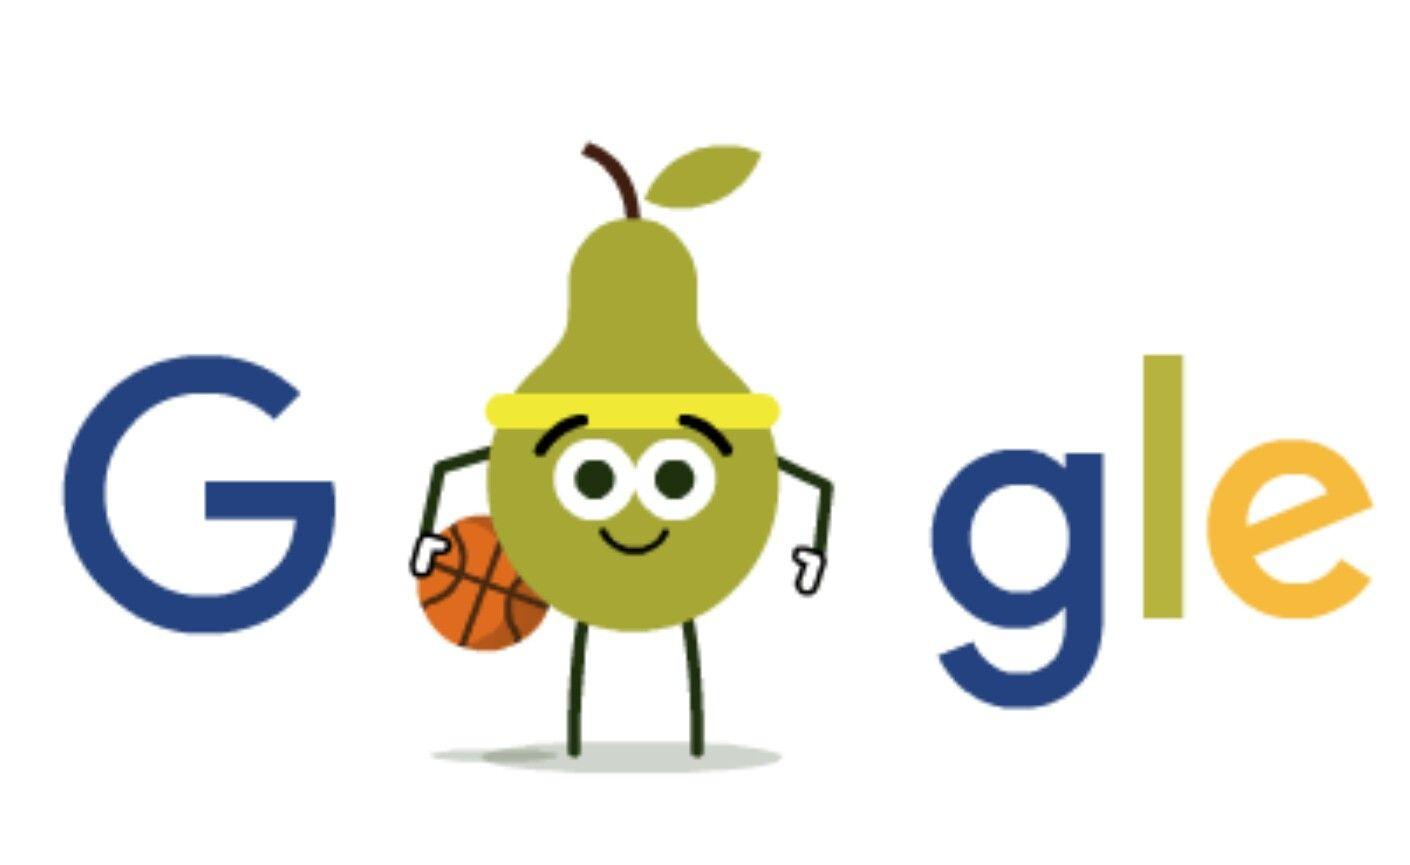 Basketball Anyone Doodle Images Google Doodles Doodles